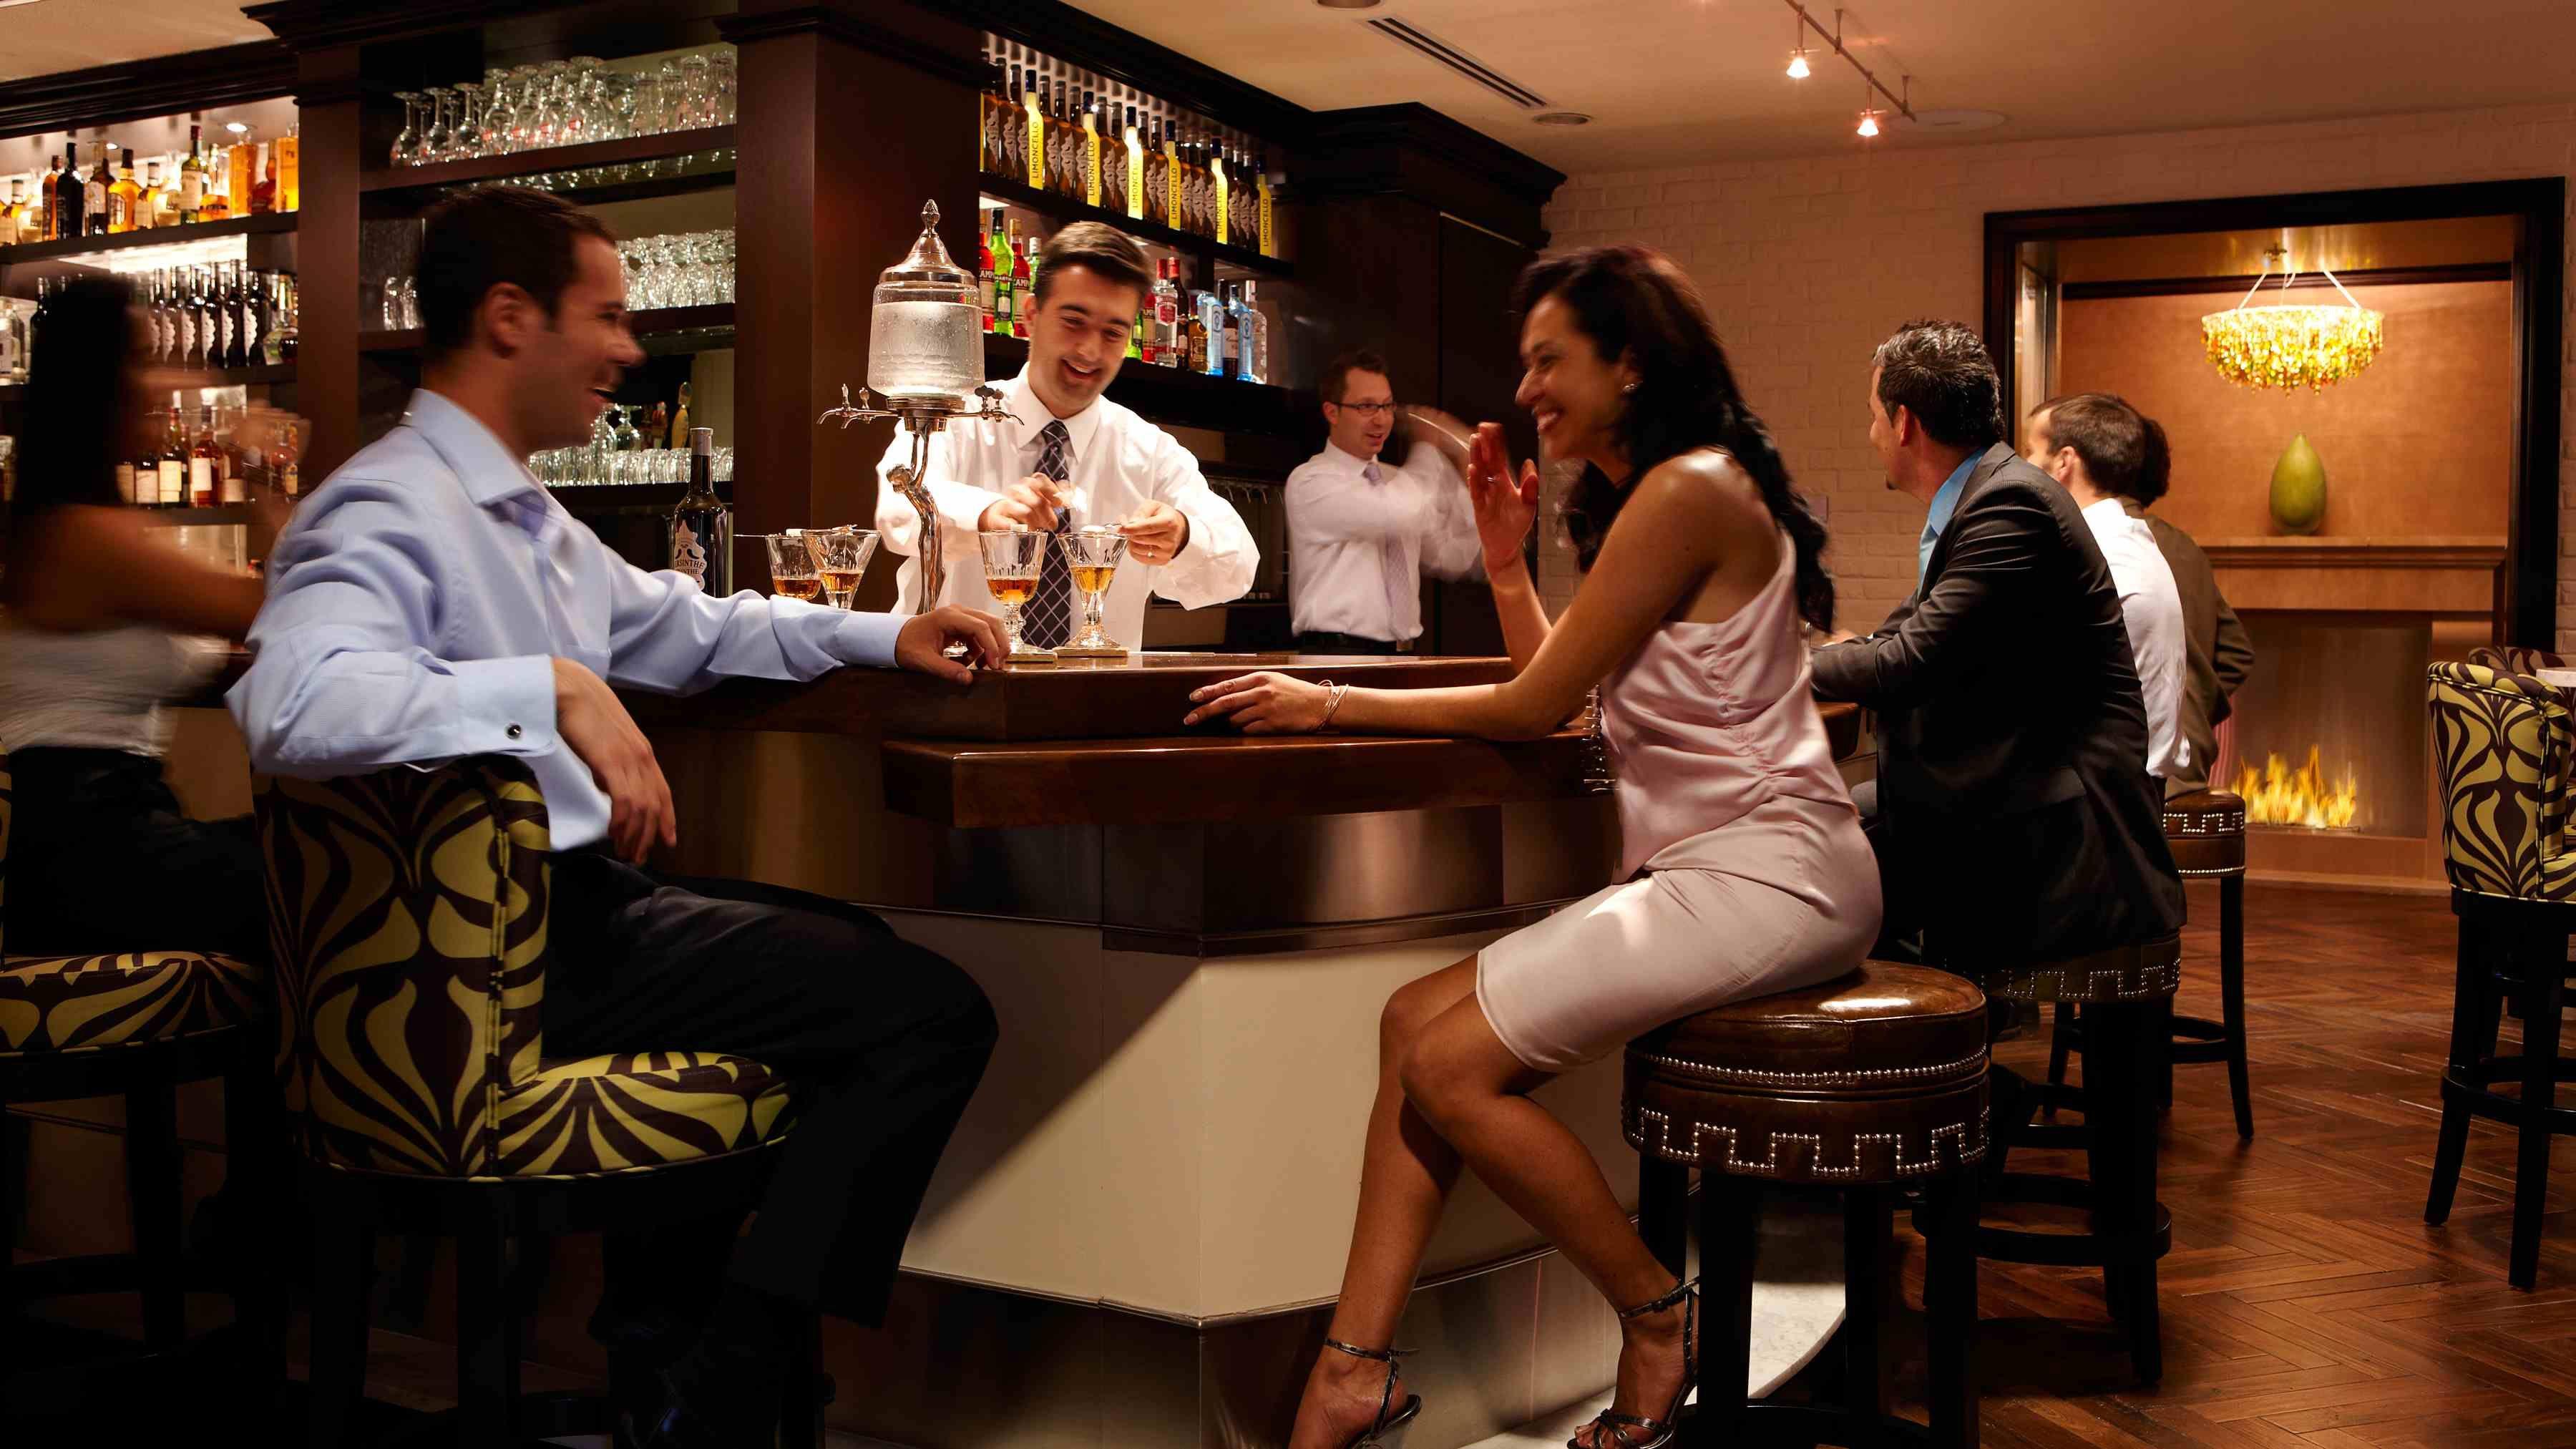 People at the bar | в баре | Бар